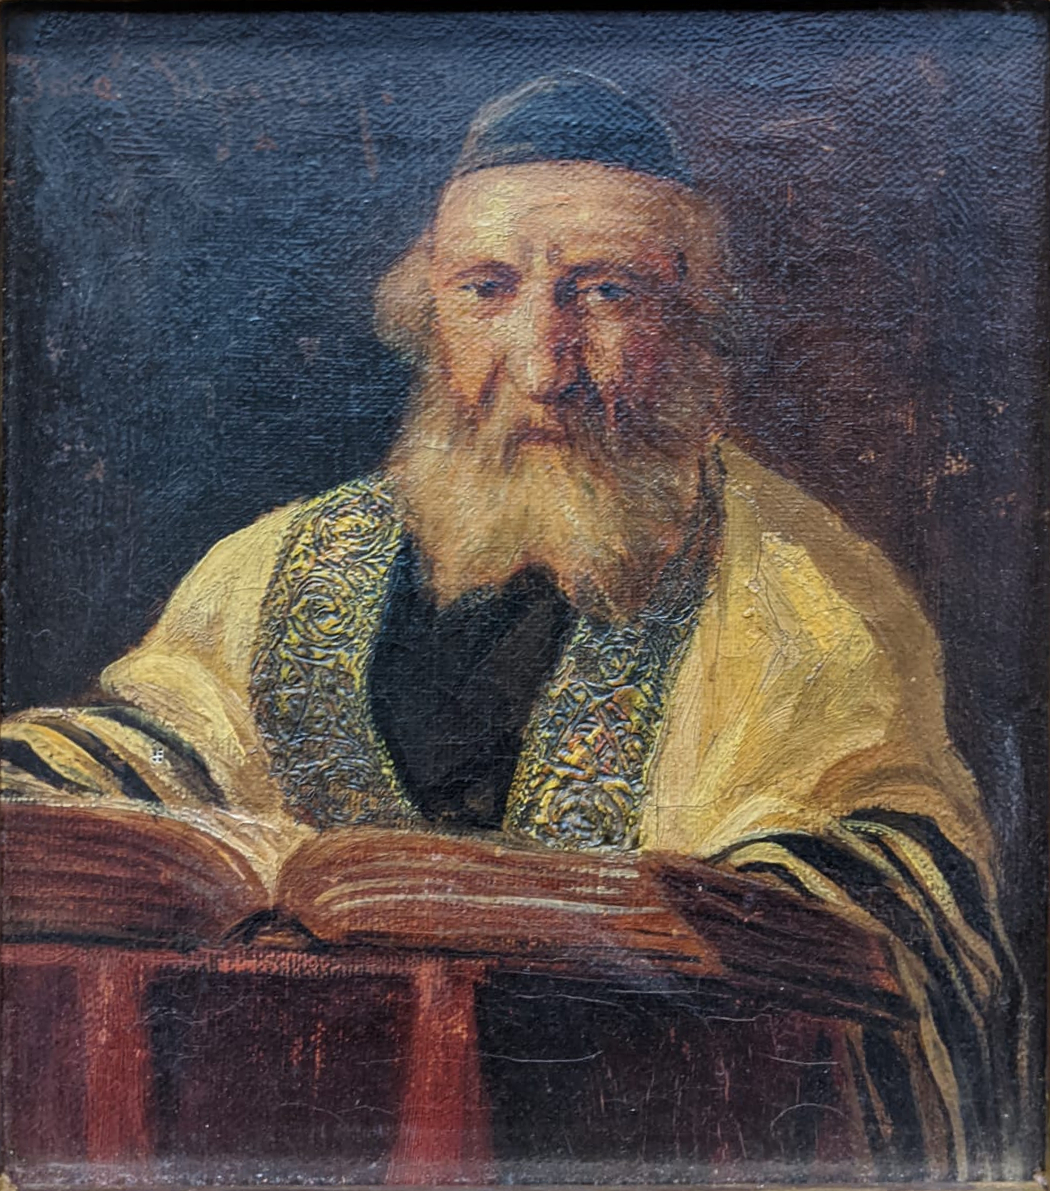 Jose Schneider (American/Spanish, 1848-1893), Rabbi Studying and Rabbi, oils on canvas, both - Image 4 of 7